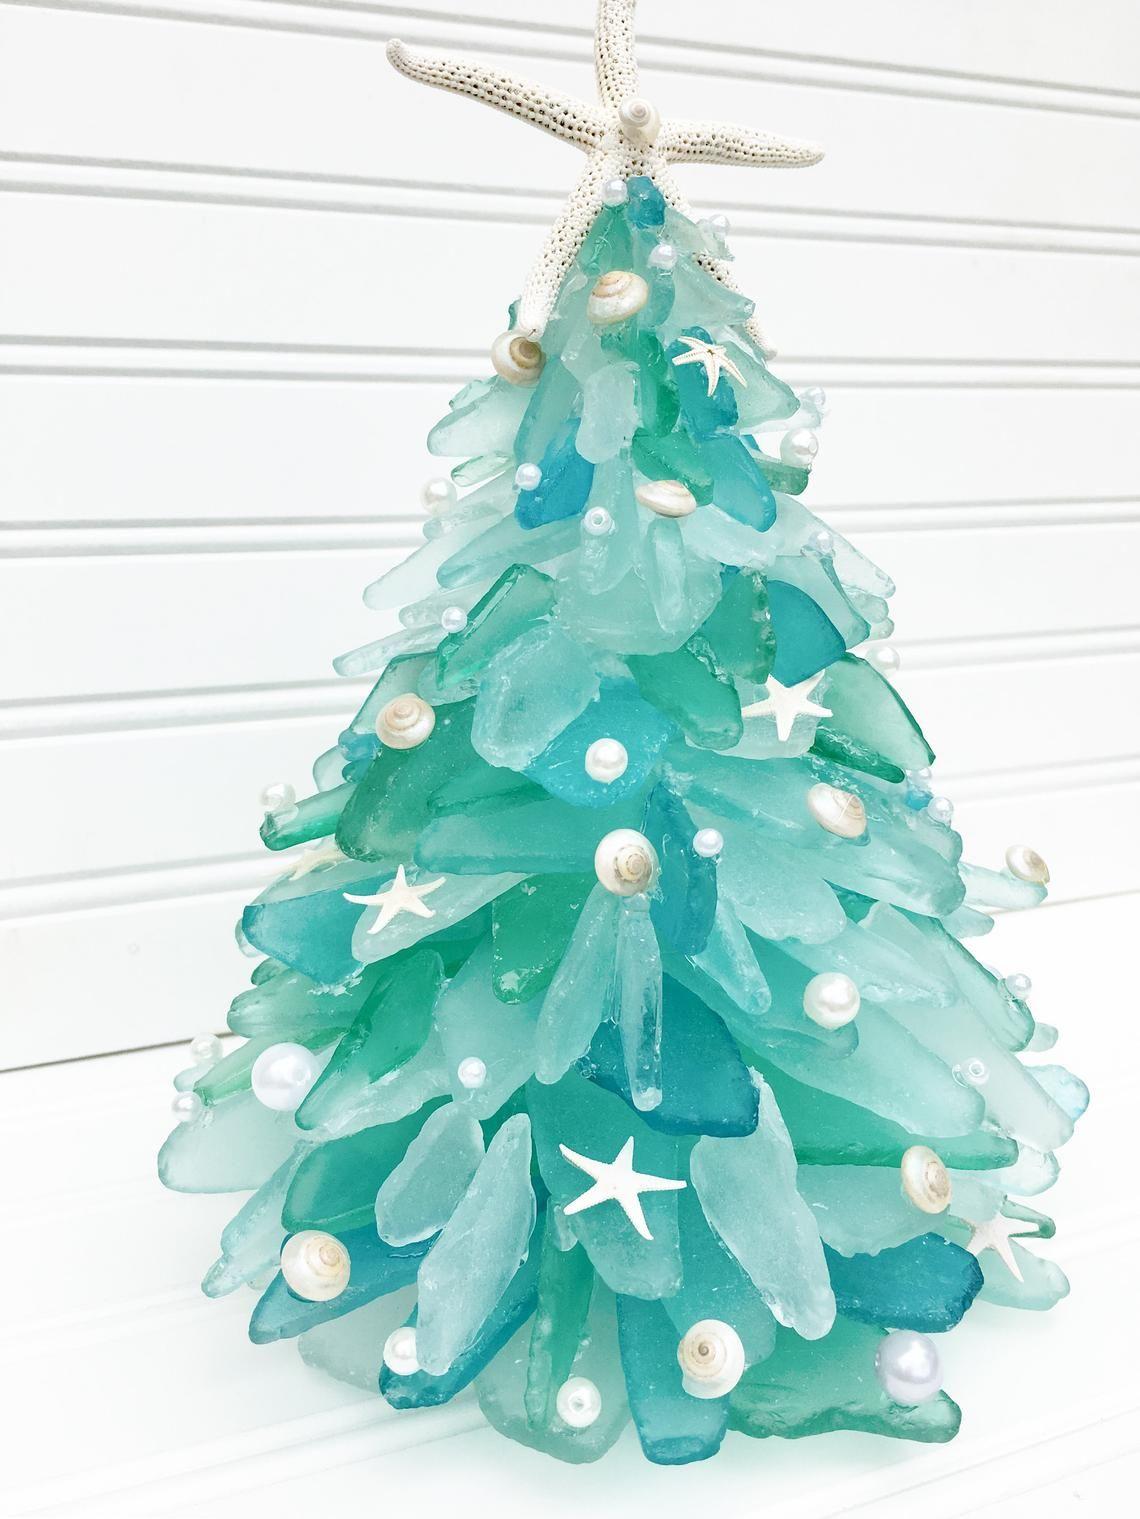 BEACH GLASS SEA GLASS CHRISTMAS TREE ORNAMENT SEA GLASS ART NAUTICAL DECOR